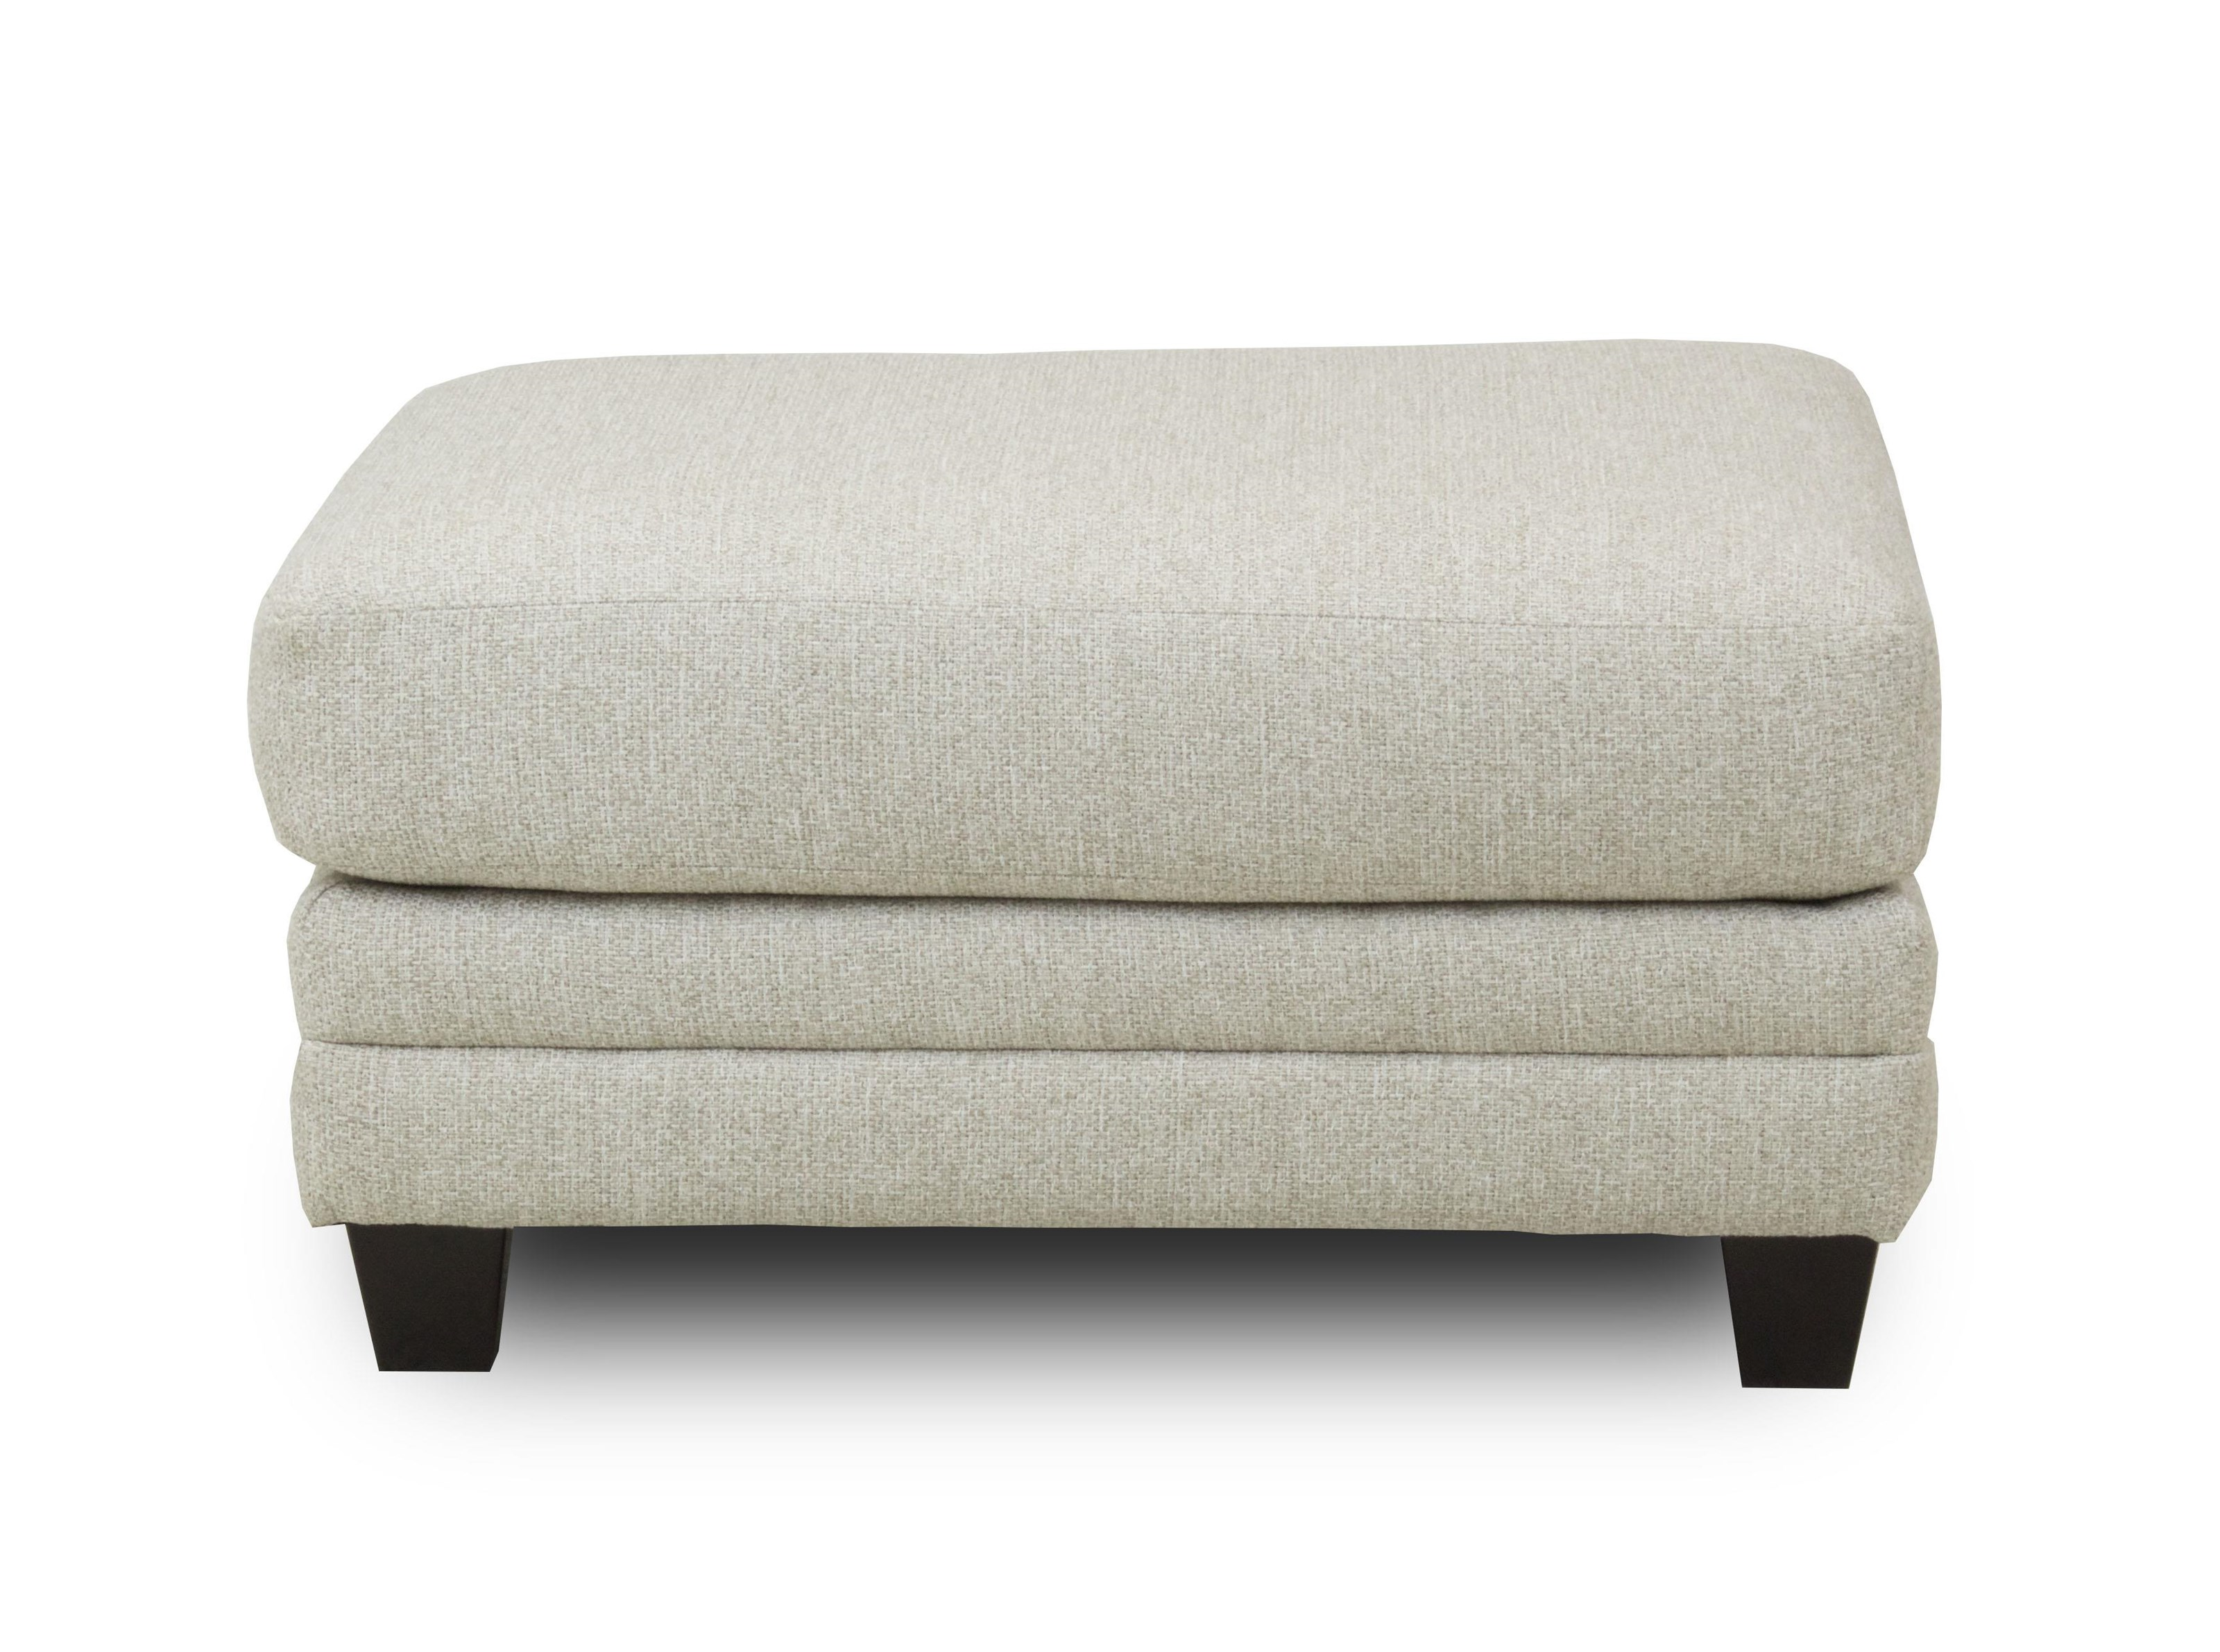 Fusion Furniture Brock Berber Ottoman - Item Number: 1744-O